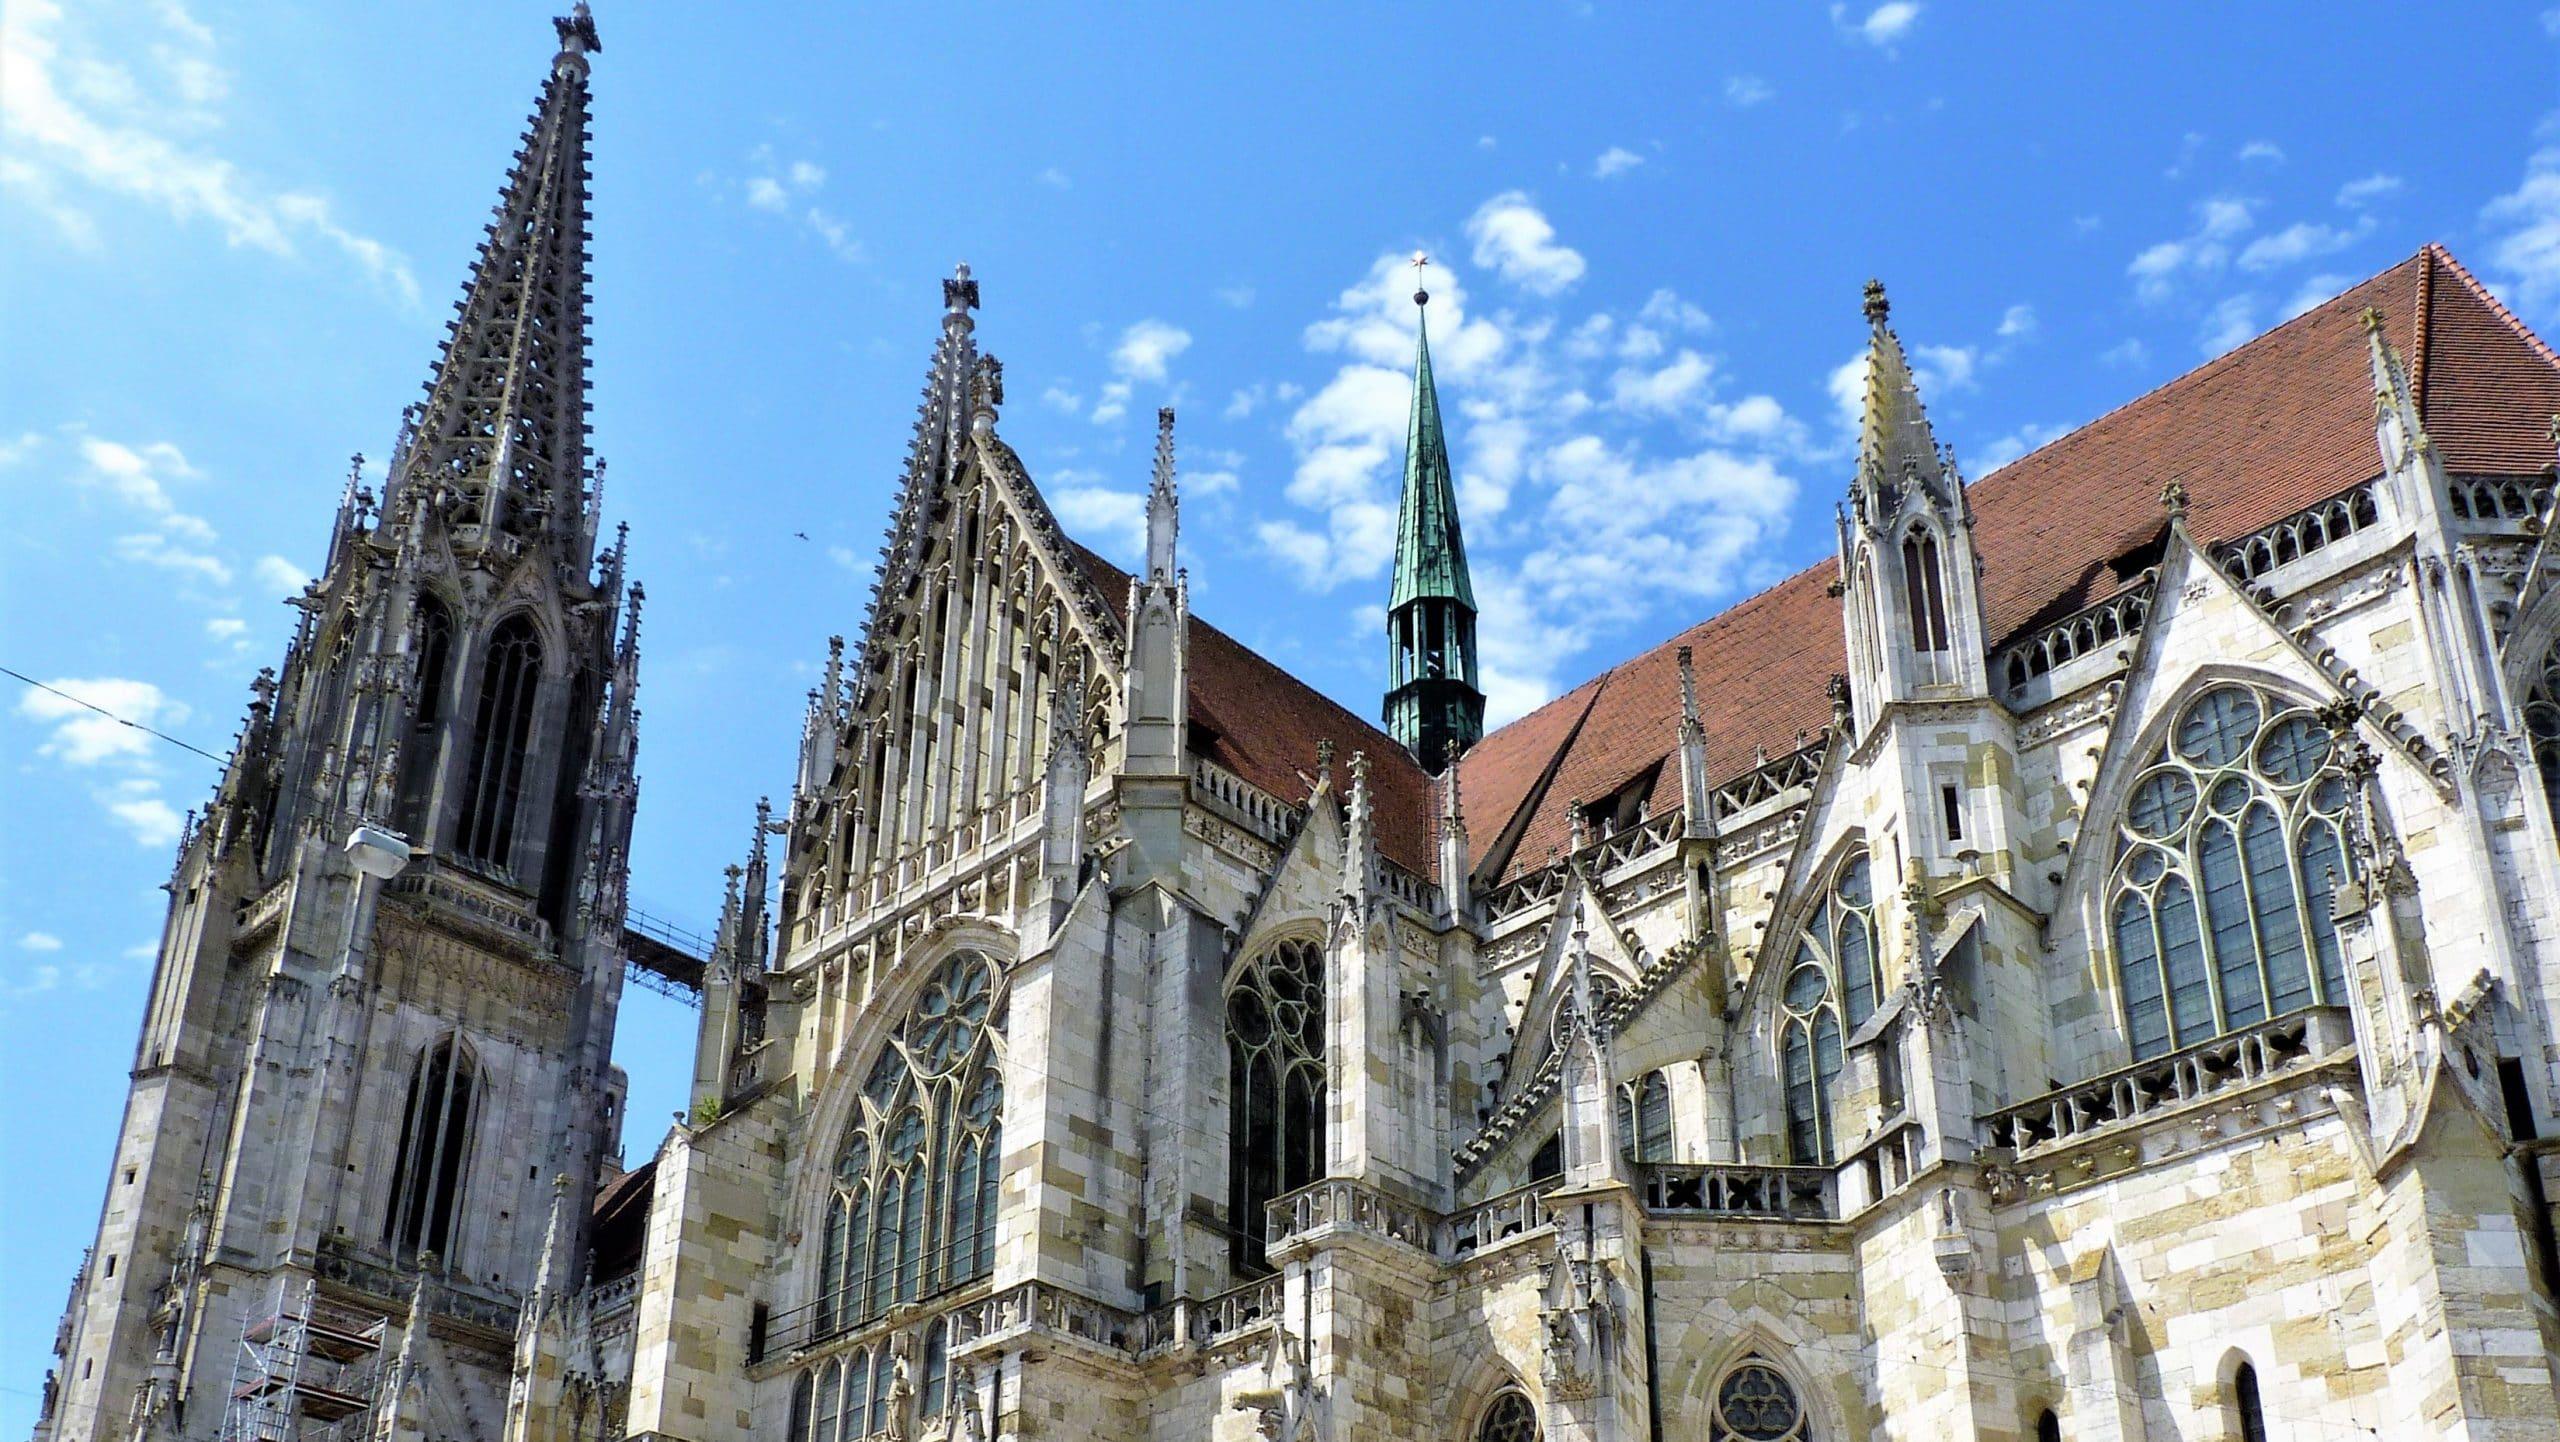 Dom Regensburg